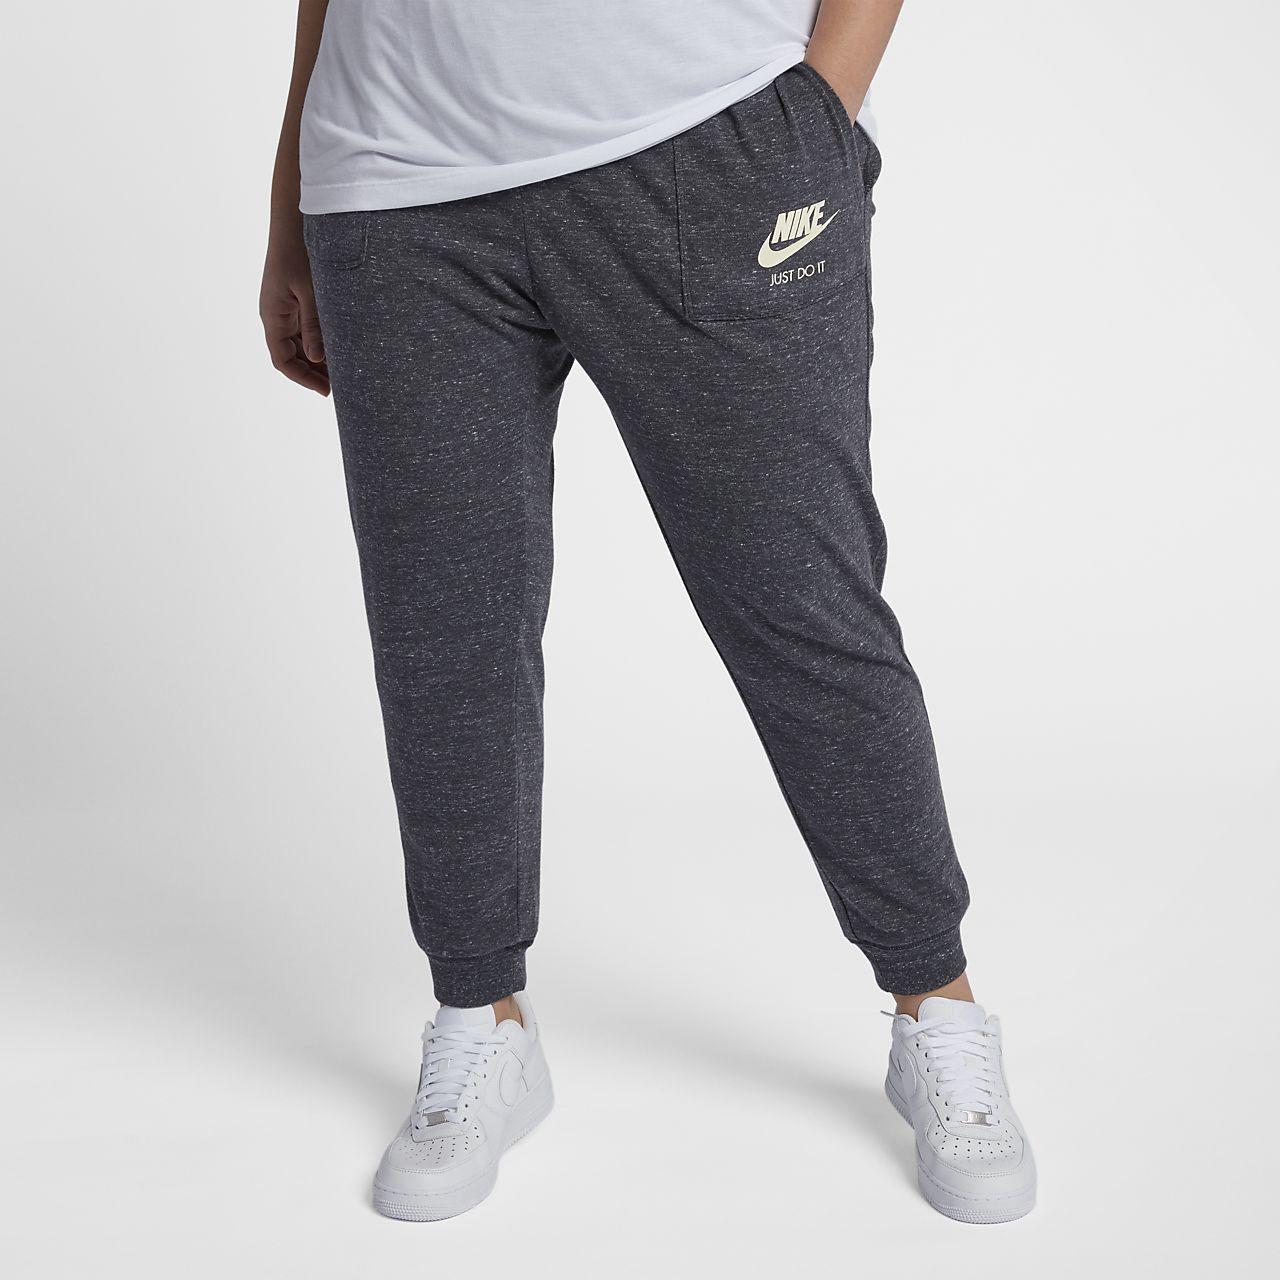 ... Nike Sportswear Gym Vintage Pantalón (Talla grande) - Mujer